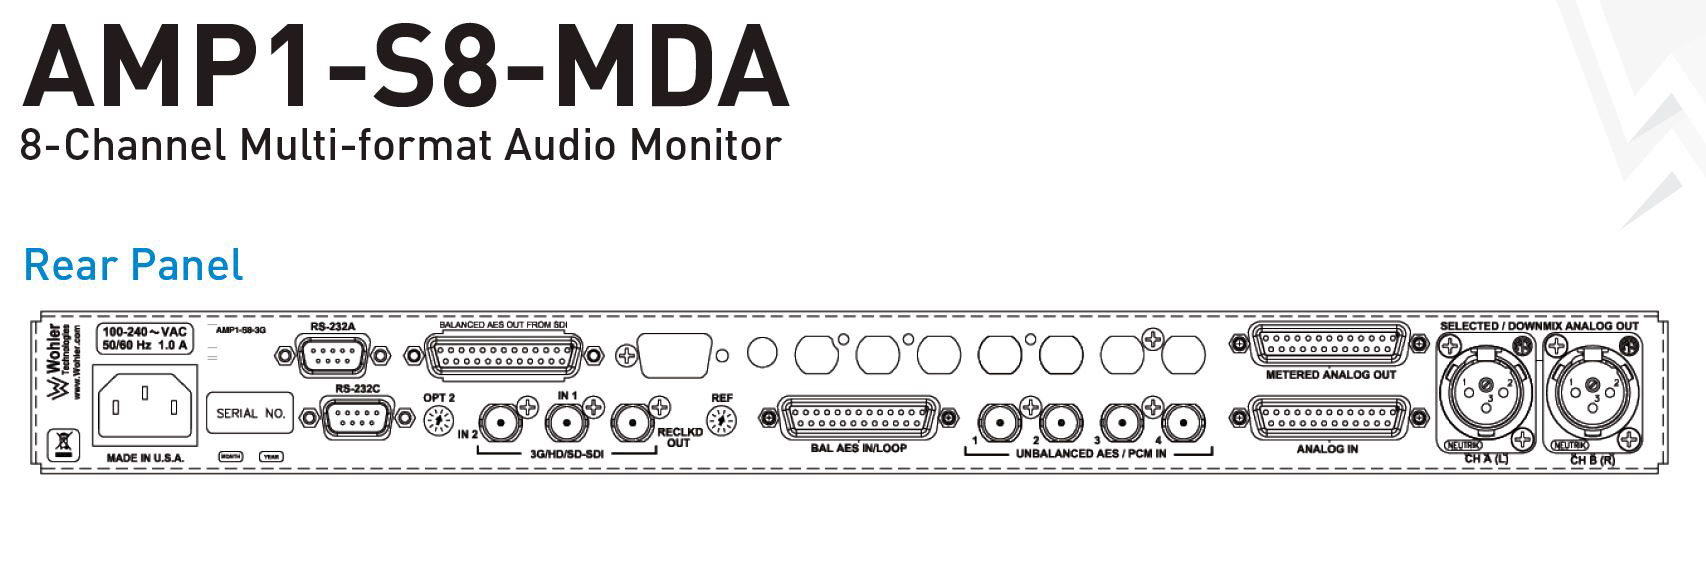 Wohler Amp1-s8mda 8 Channel Hd-sdi Sd-sdi Aes Cameras & Photo Ebu Und Analog Audio Monitor Easy To Use